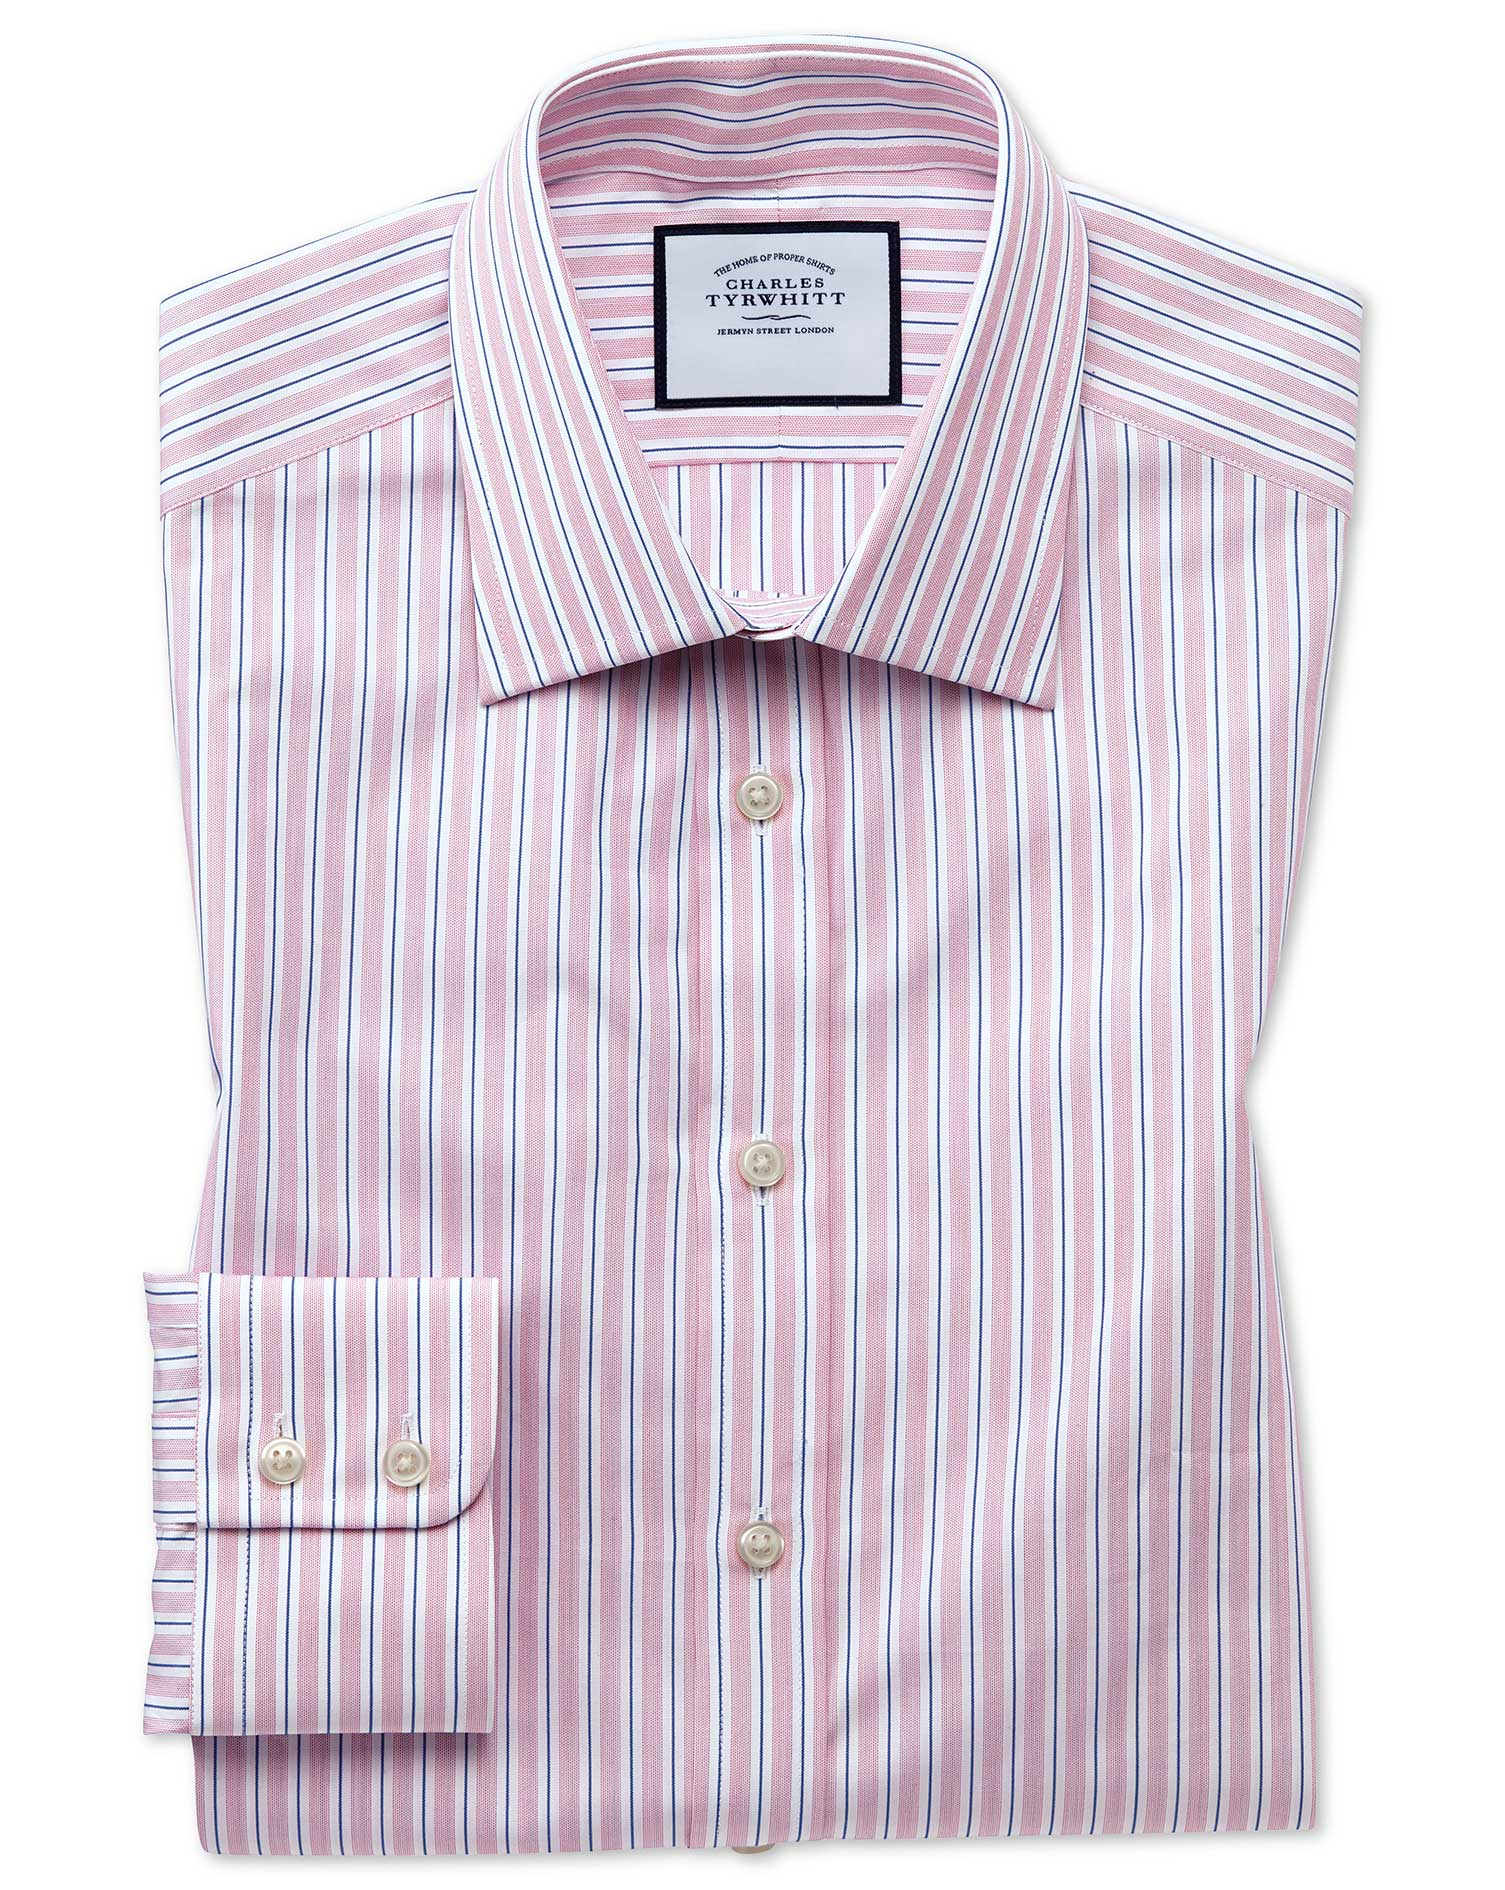 Slim Fit Egyptian Cotton Poplin Pink Stripe Formal Shirt Single Cuff Size 16.5/34 by Charles Tyrwhit